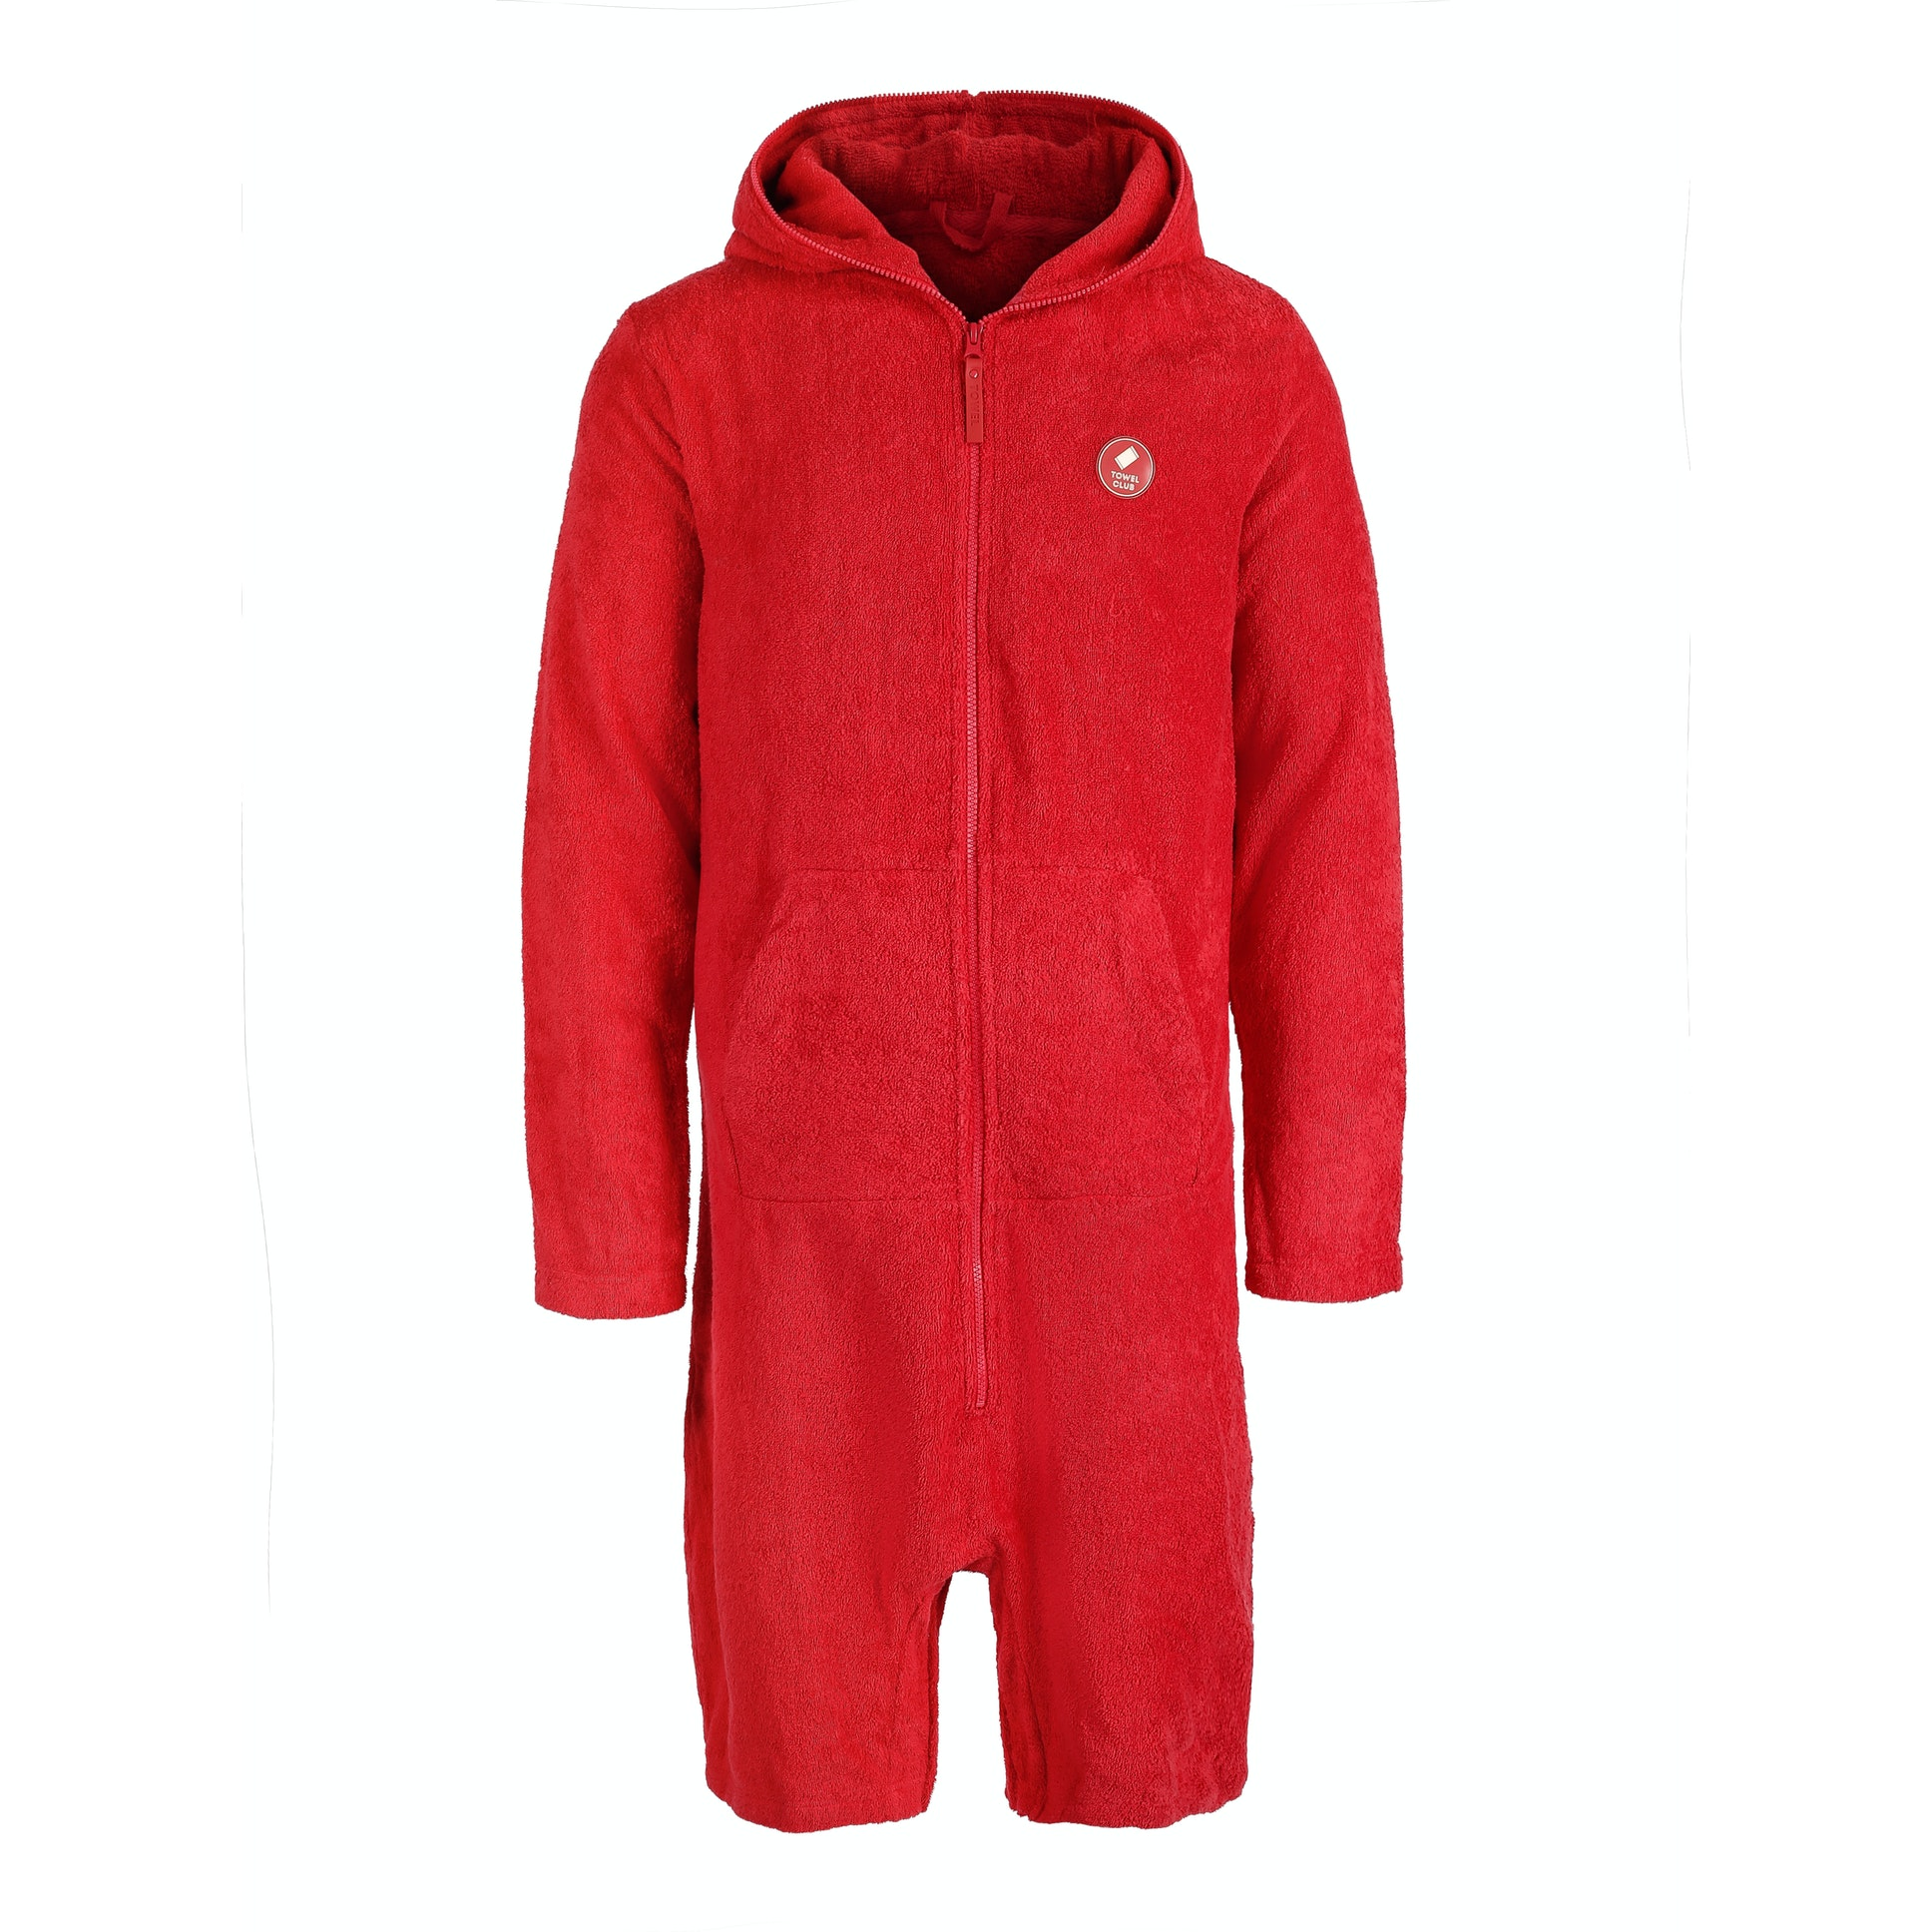 towel club x onepiece towel jumpsuit retro red